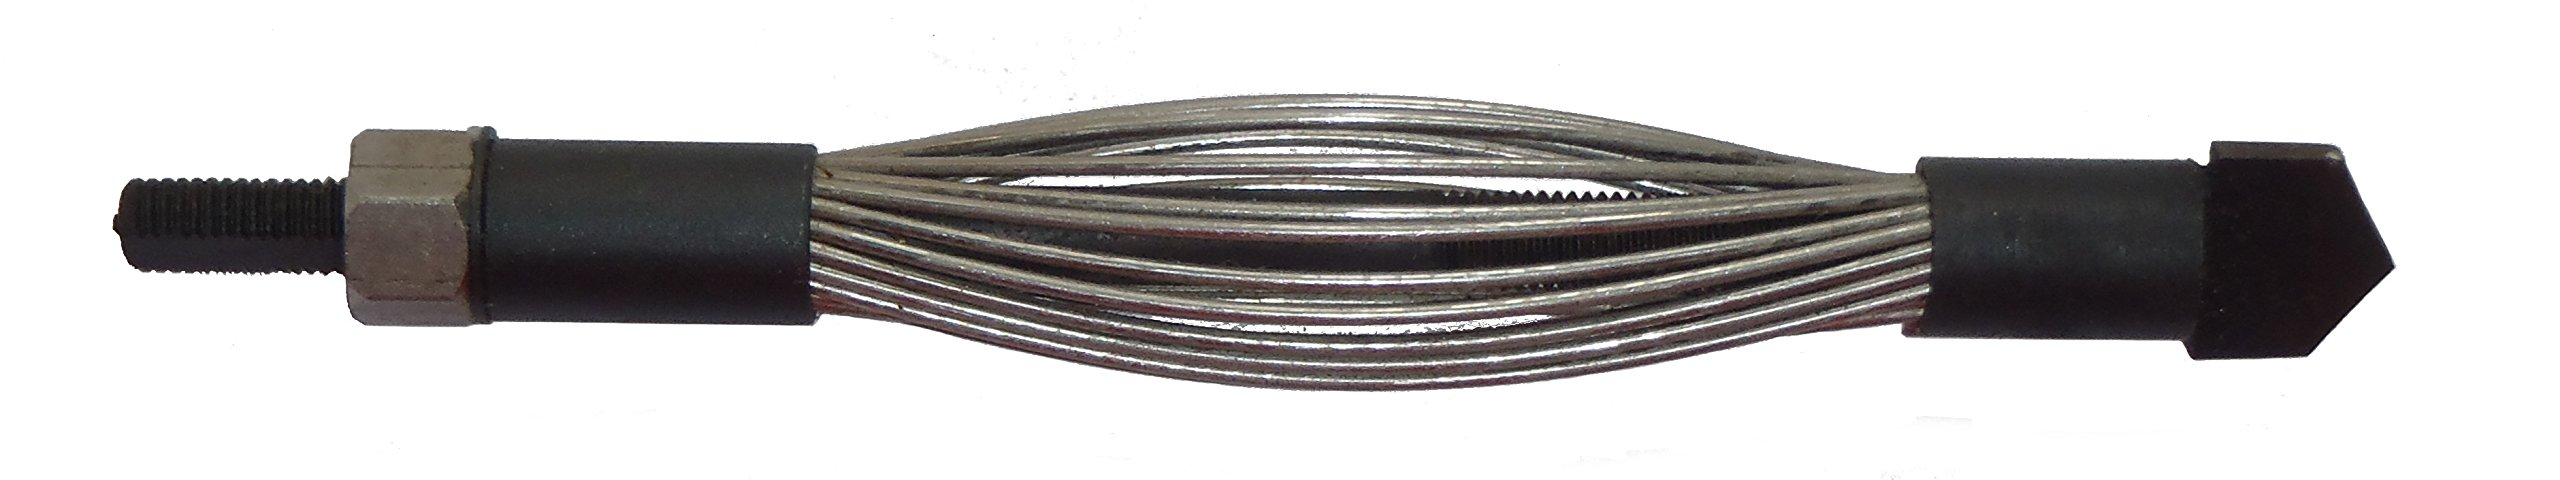 John R. Robinson - Adjustable Cutting & Buffing Tool W/Drill Tip